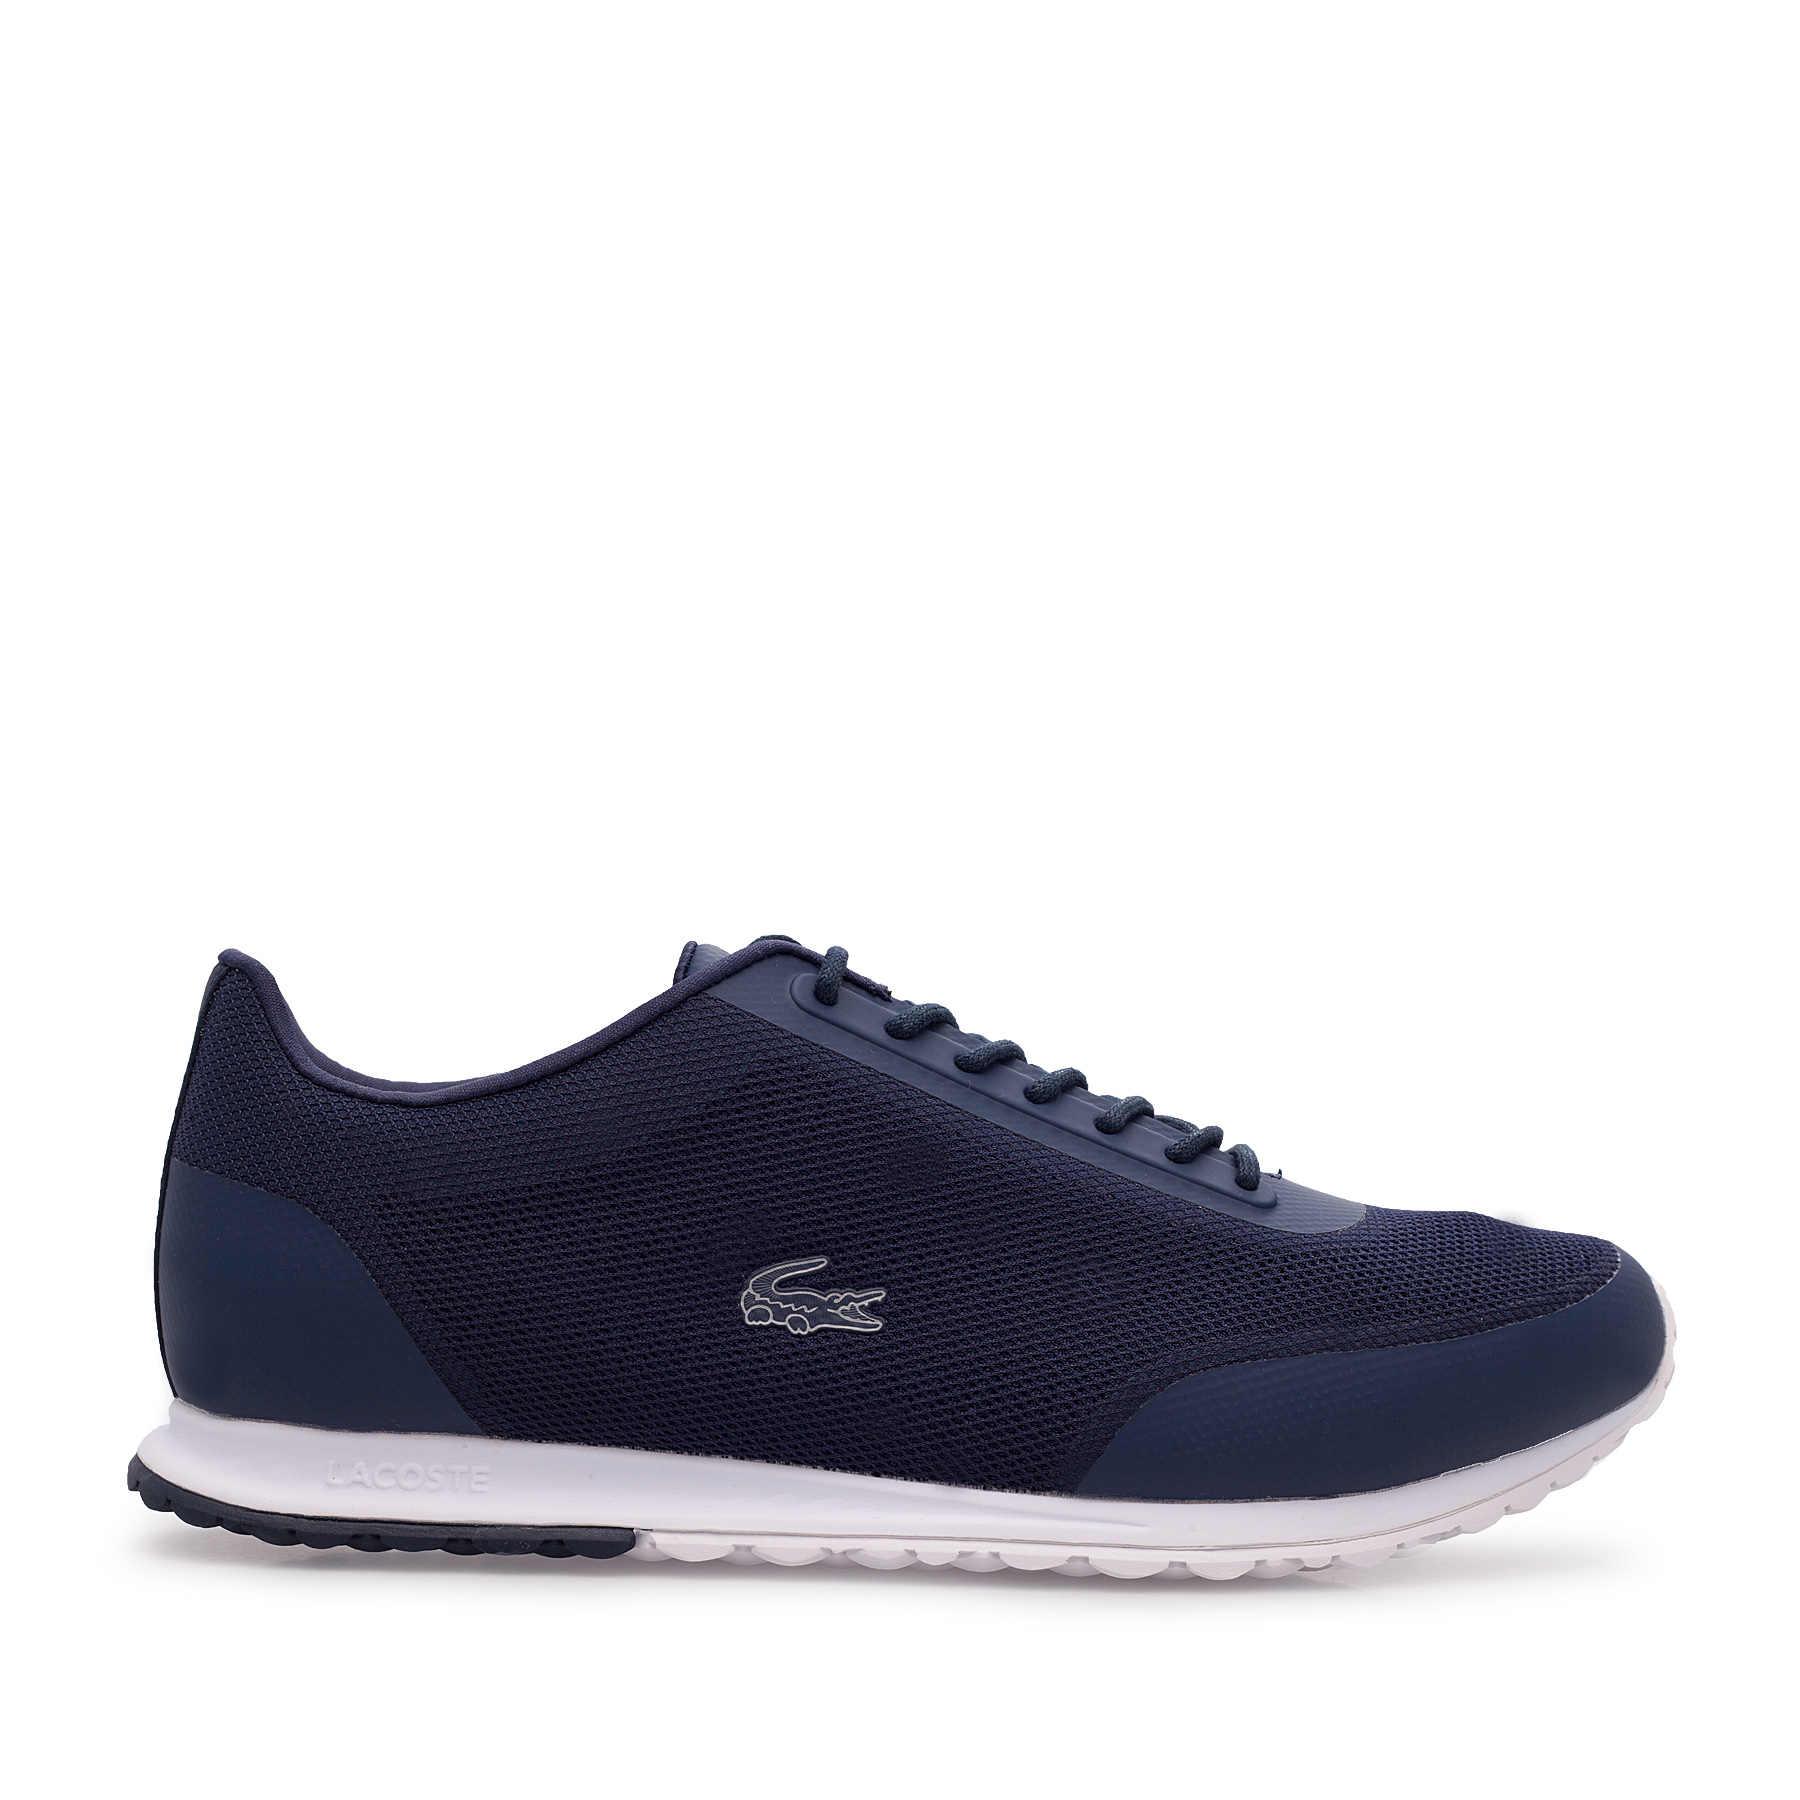 Lacoste Shoes WOMEN SHOES 7 Women's